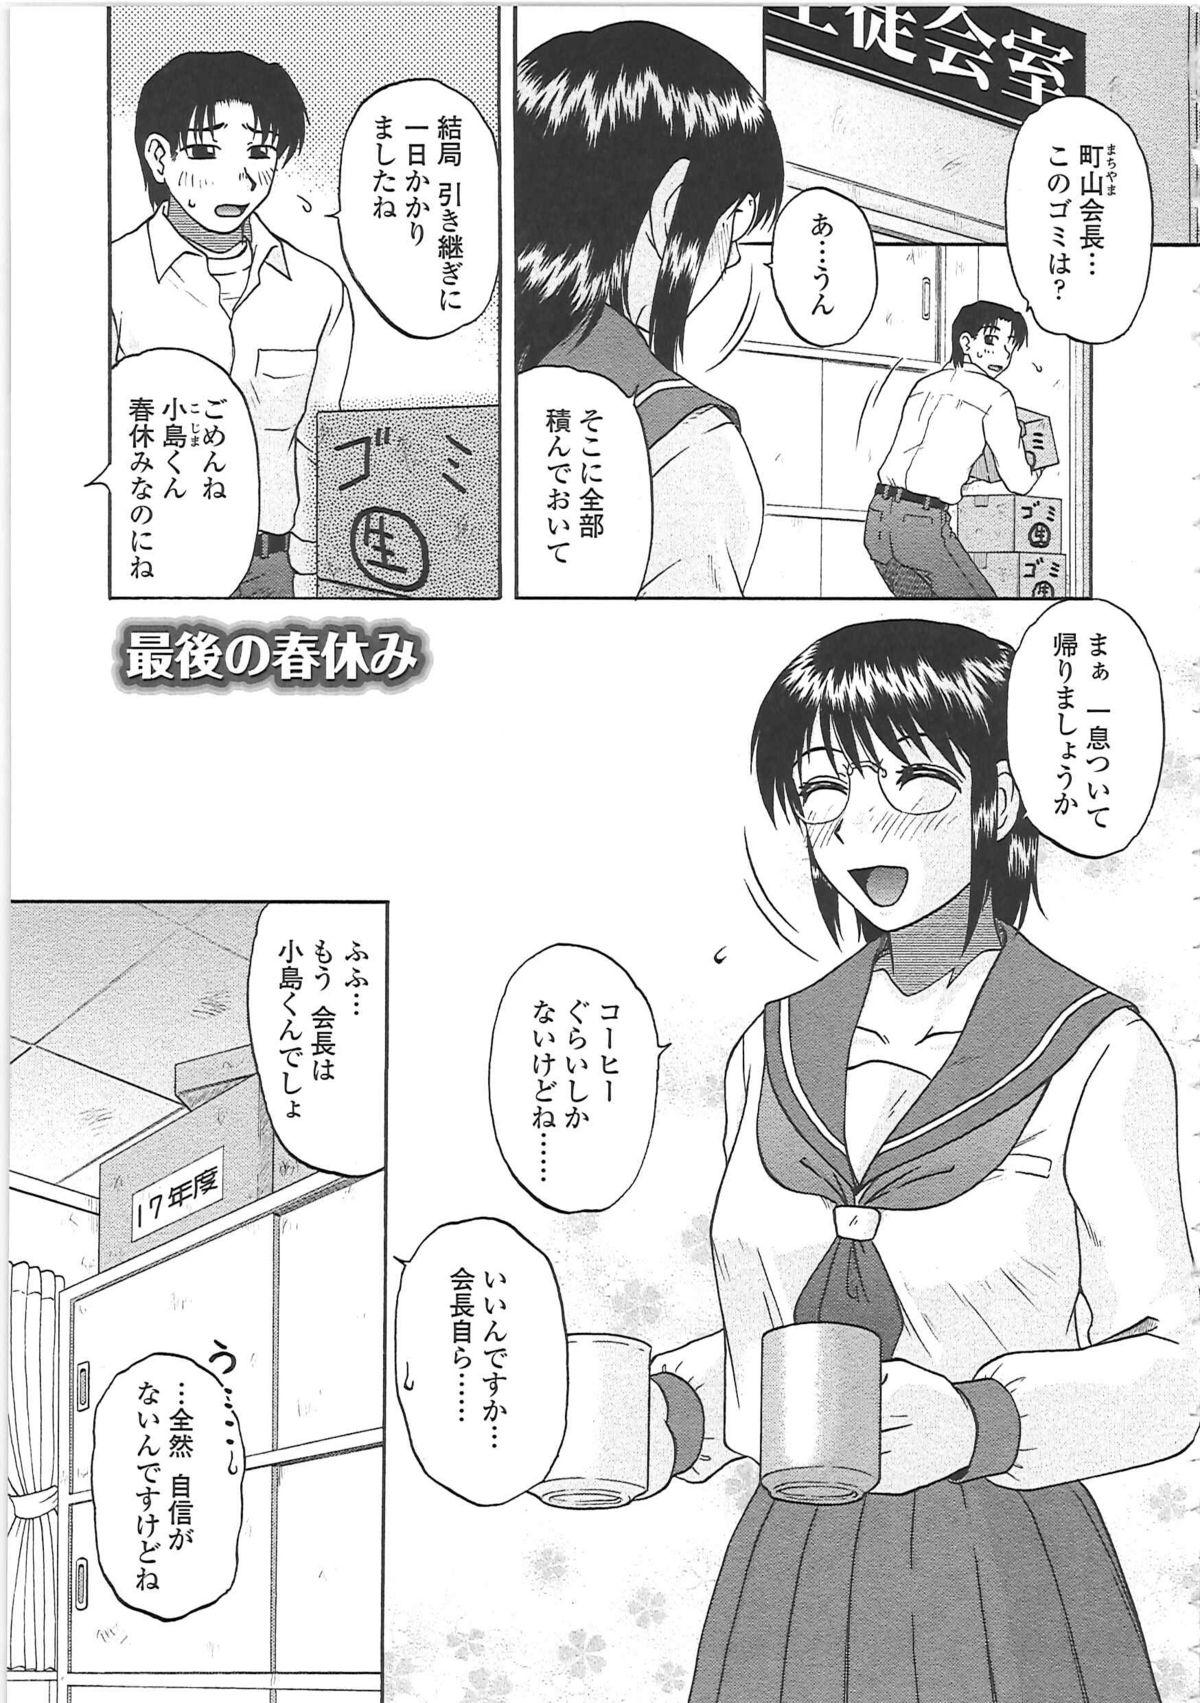 Nikuzuma Tsuushin - Erotic Wife Communication 79